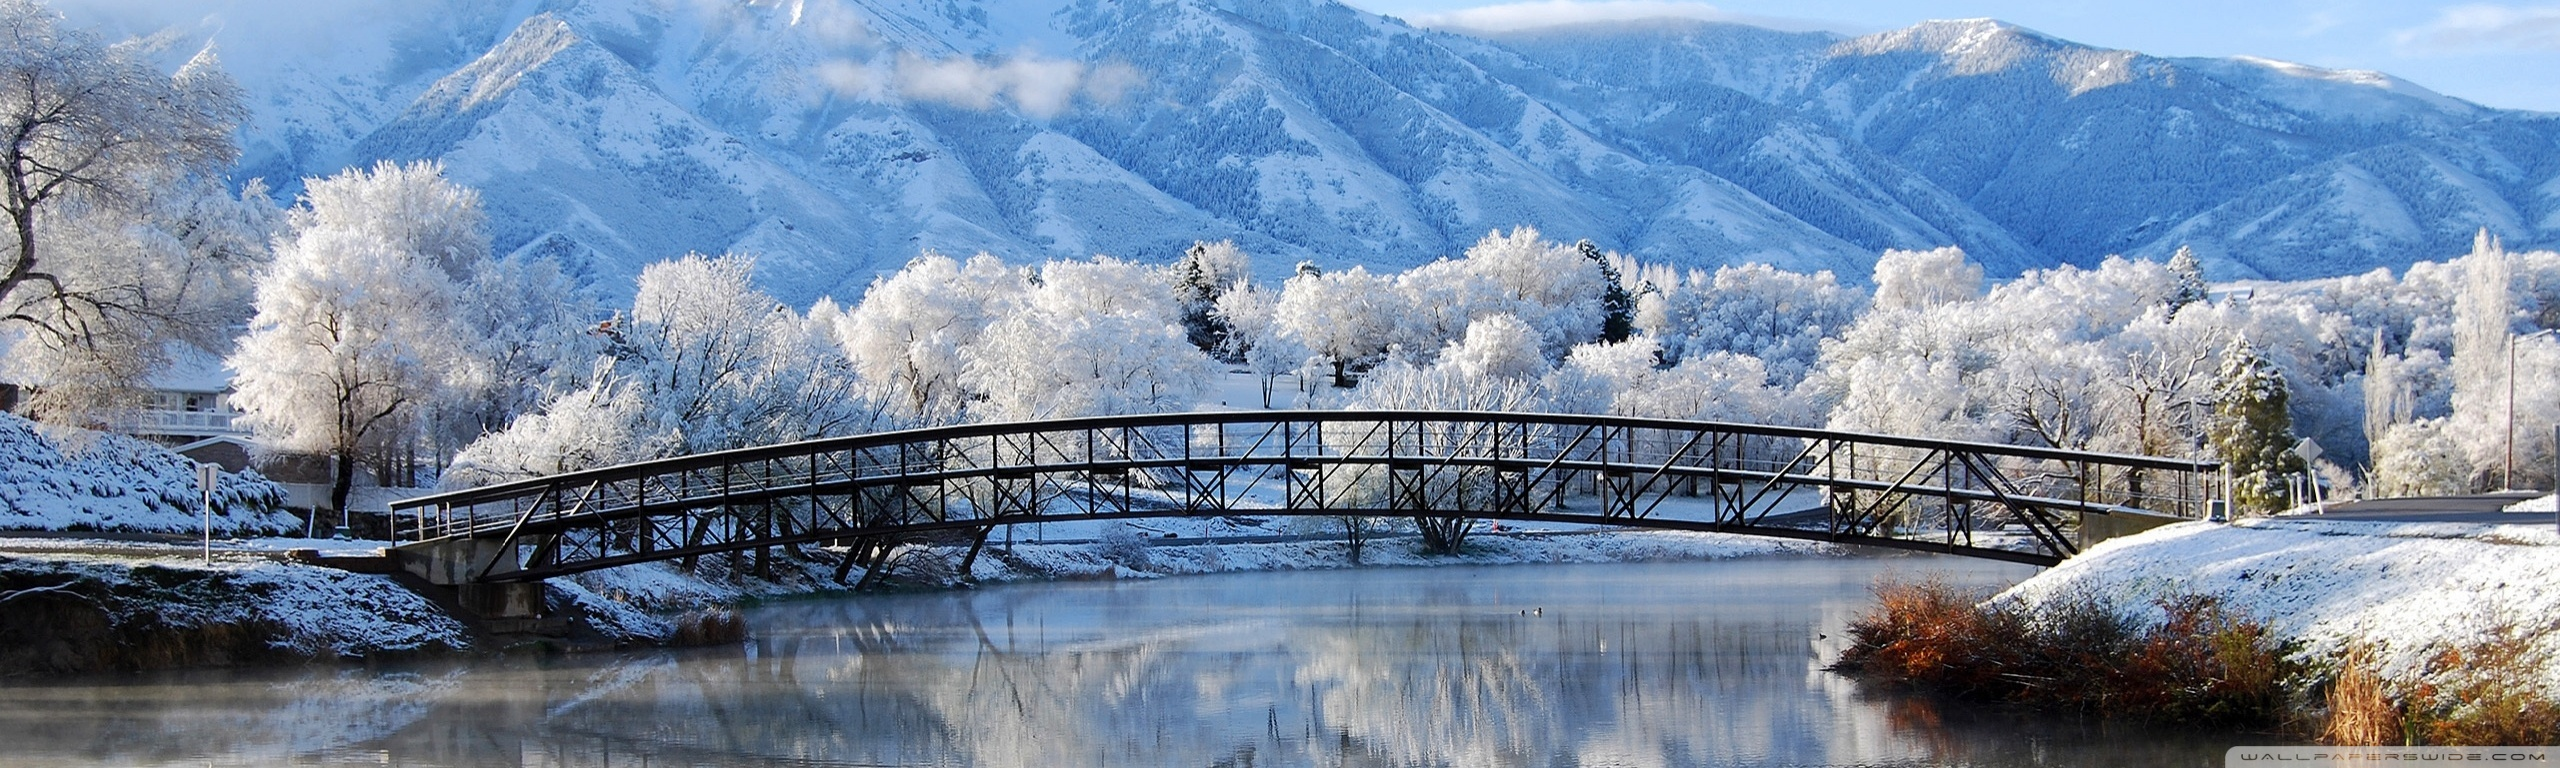 Falling Snow Wallpaper Widescreen Beautiful Winter Wallpaper 2560x768 7909